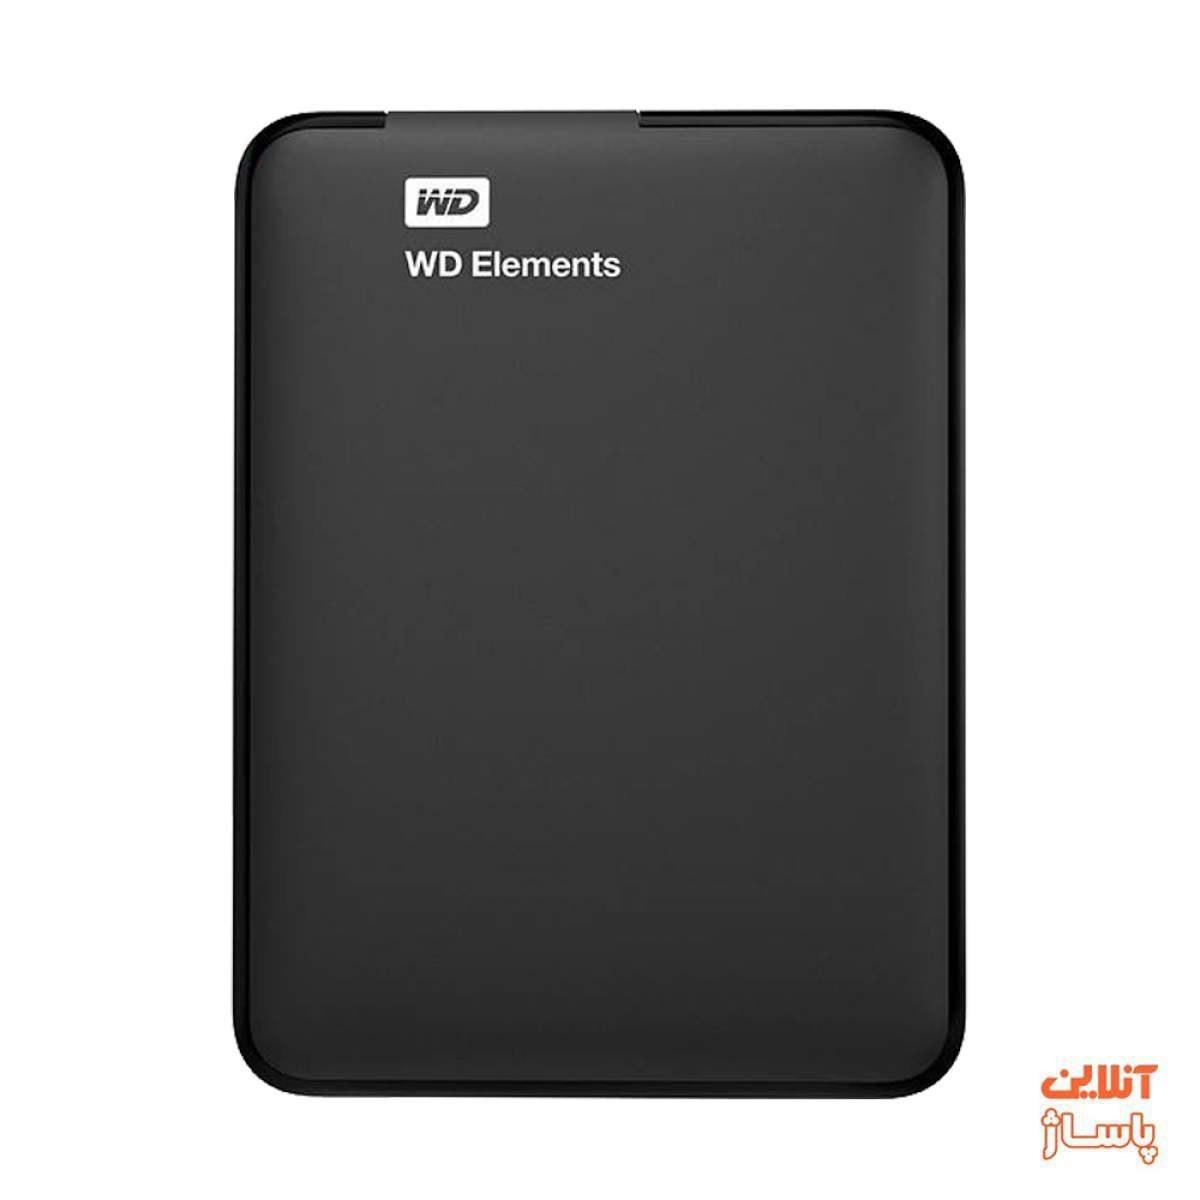 تصویر هارد اکسترنال وسترن دیجیتال مدل Elements ظرفیت 500 گیگابایت Western Digital Elements External Hard Drive - 500GB